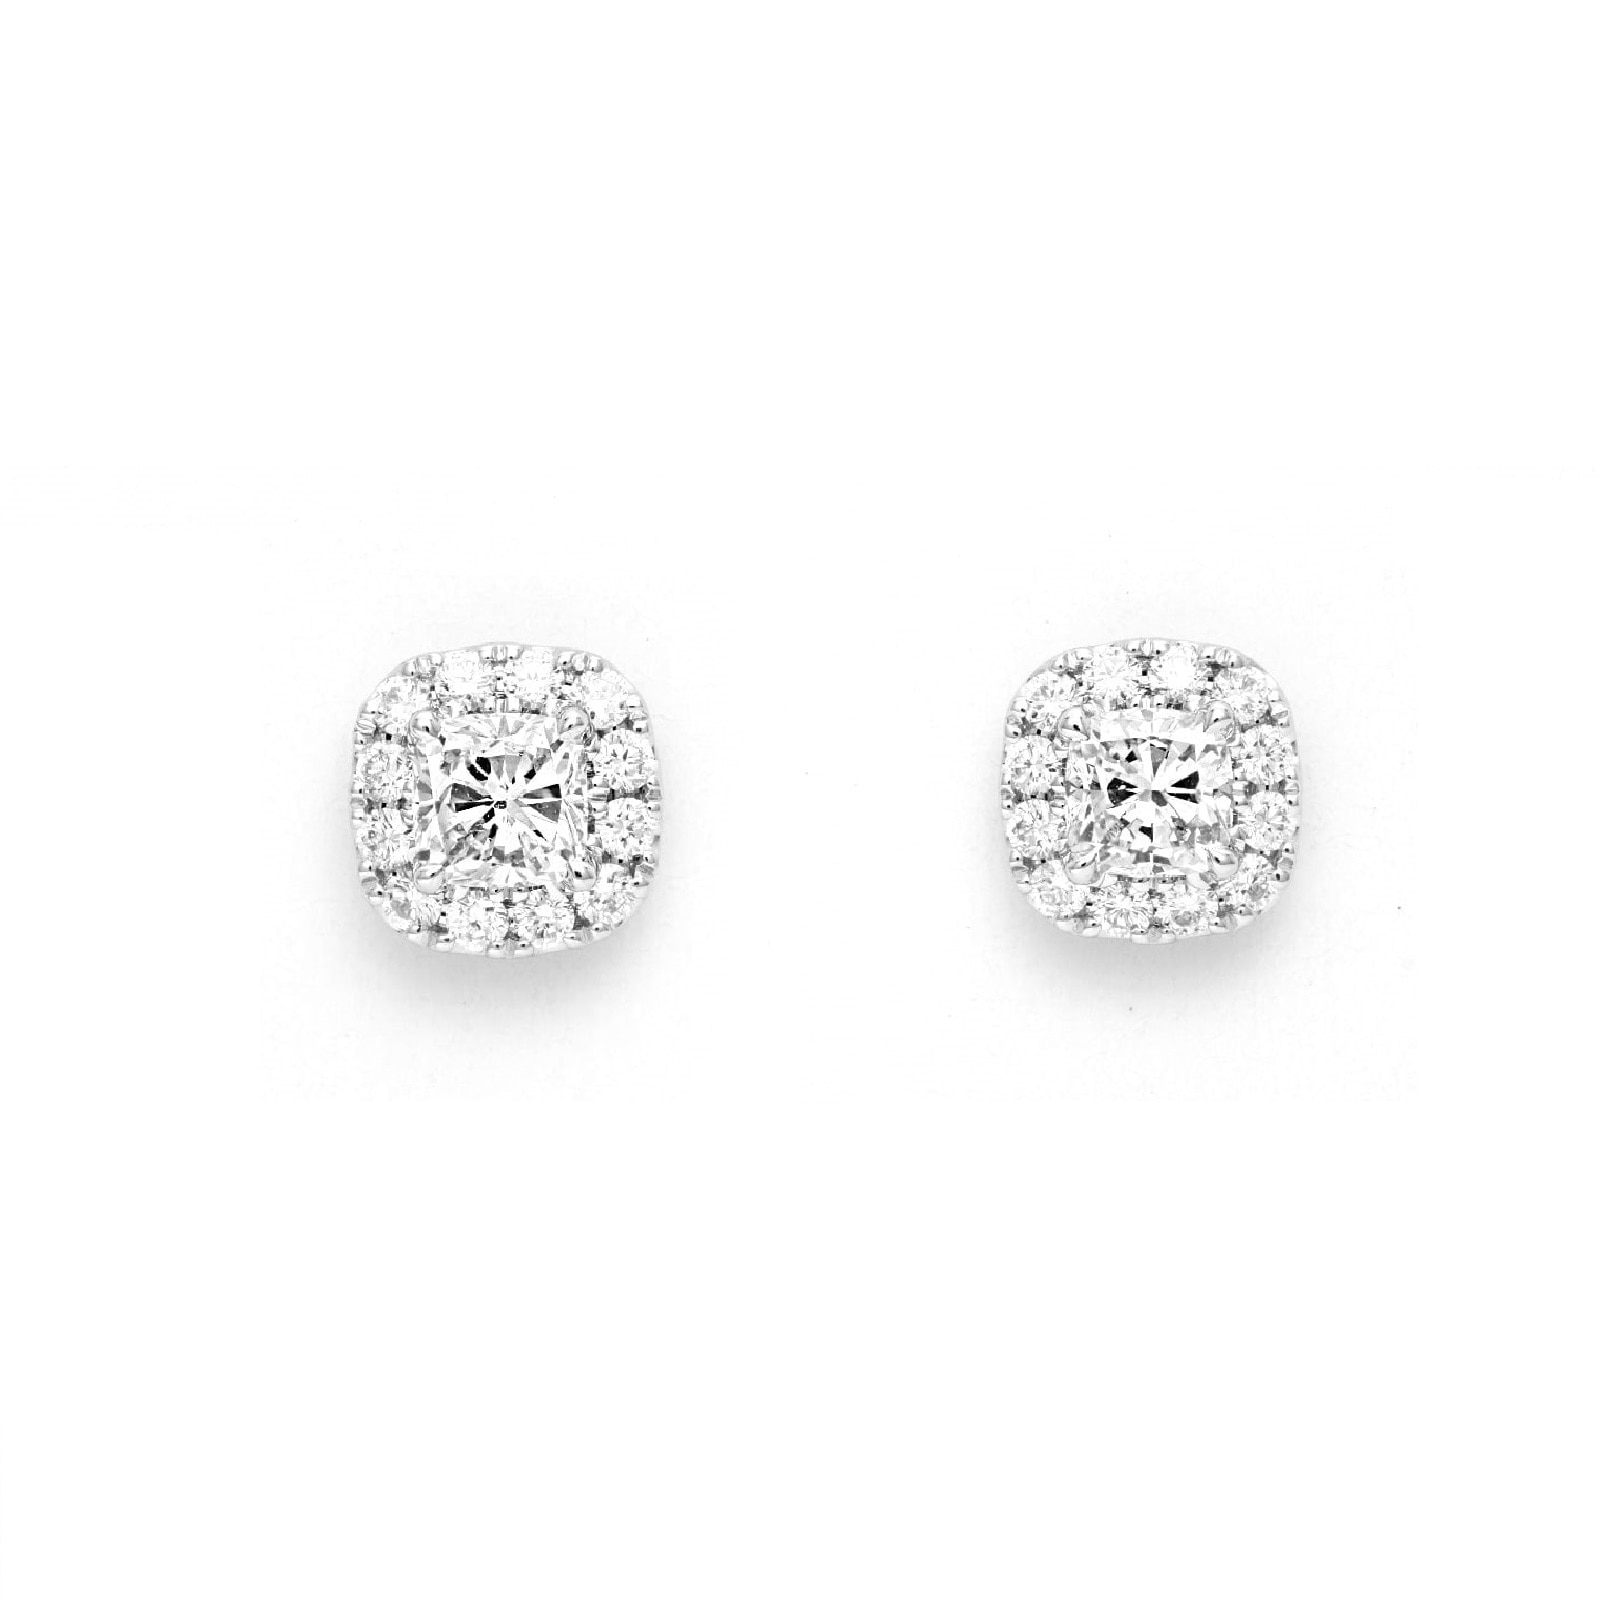 Mayors 18ct White Gold 1.45ct Cushion Single Halo Earrings